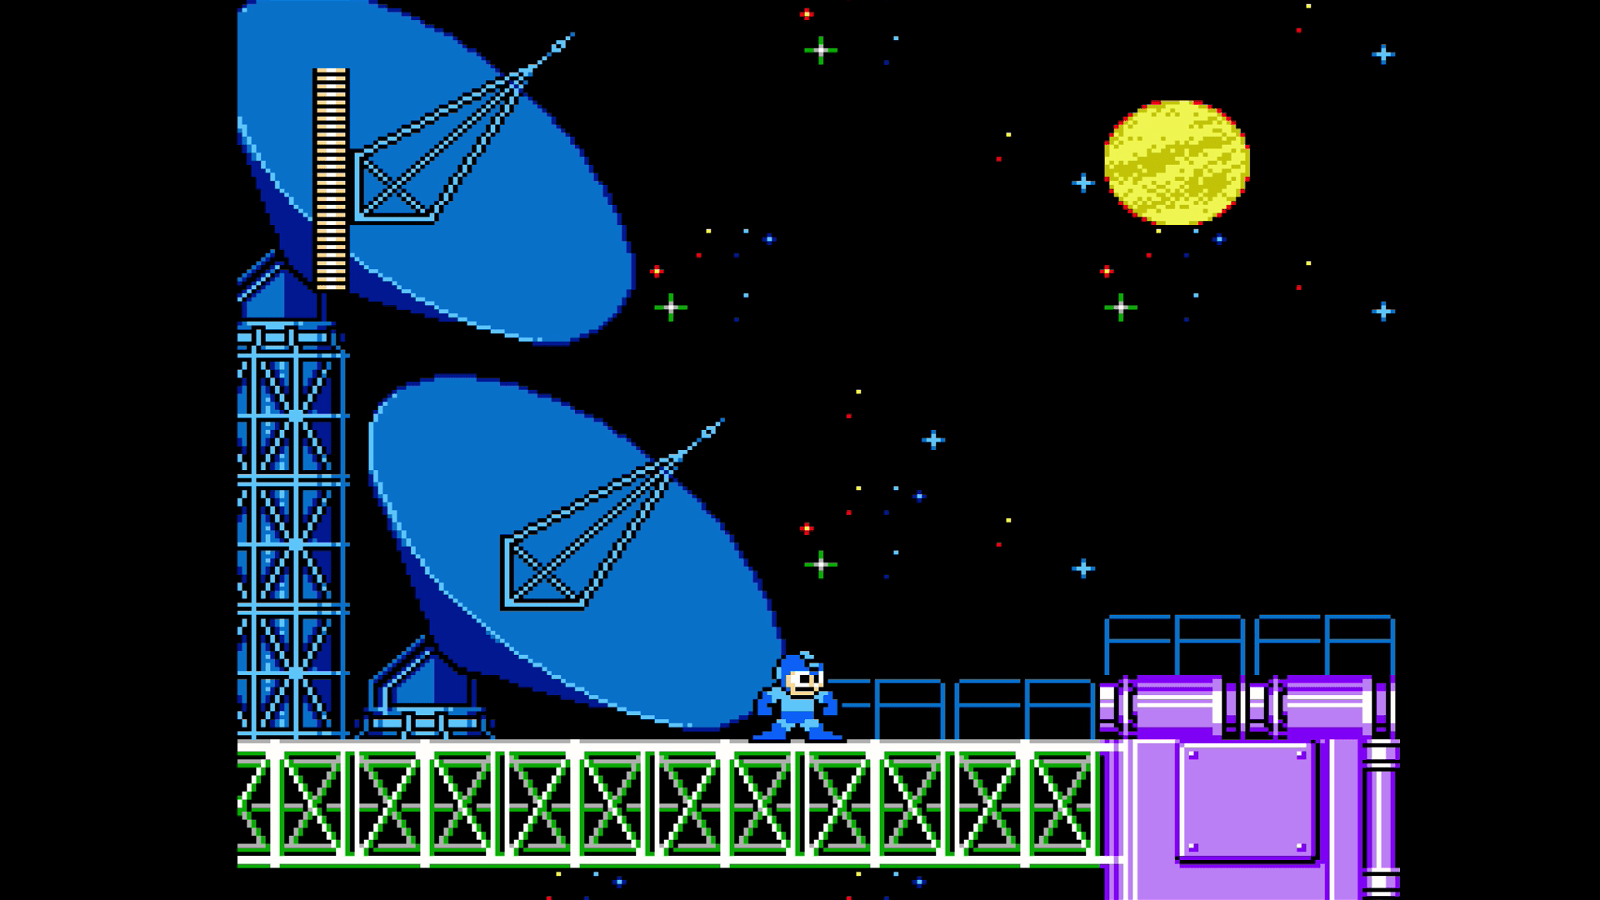 Capcom Announces Mega Man Legacy Collection And Confirms E3 Lineup - 2015-06-08 11:12:10